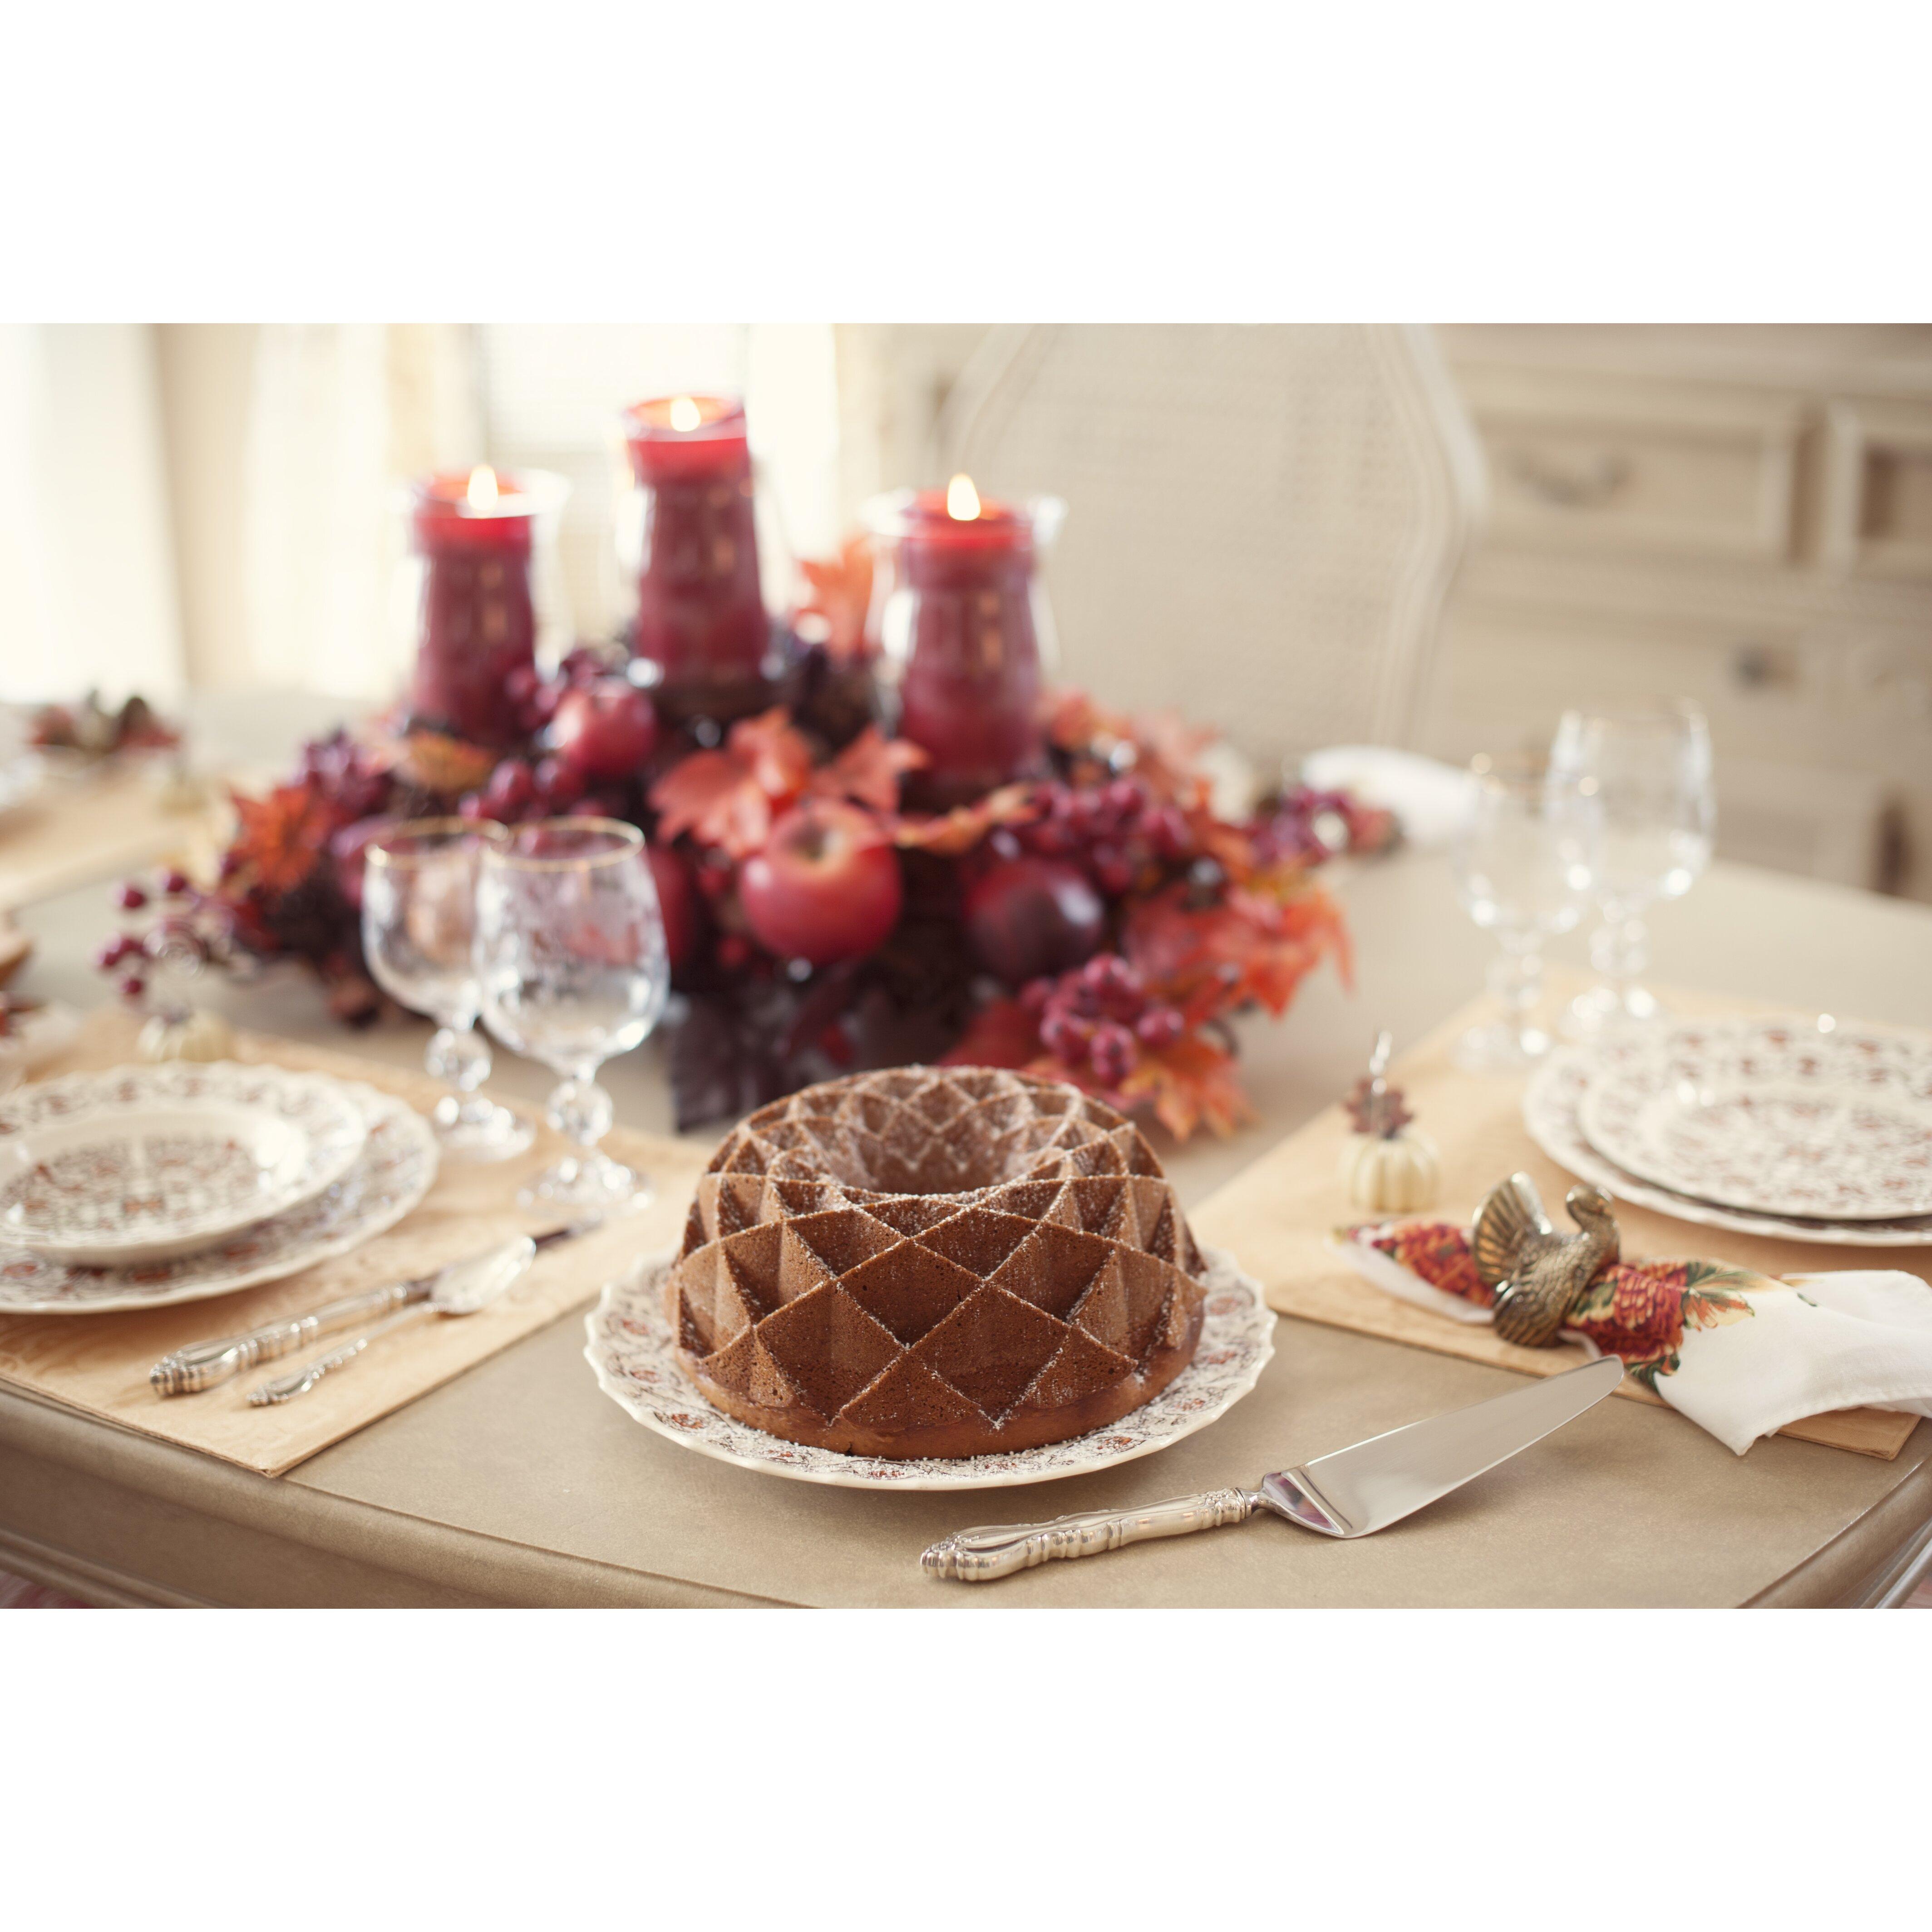 Nordic Ware Jubilee Bundt Cake Pan